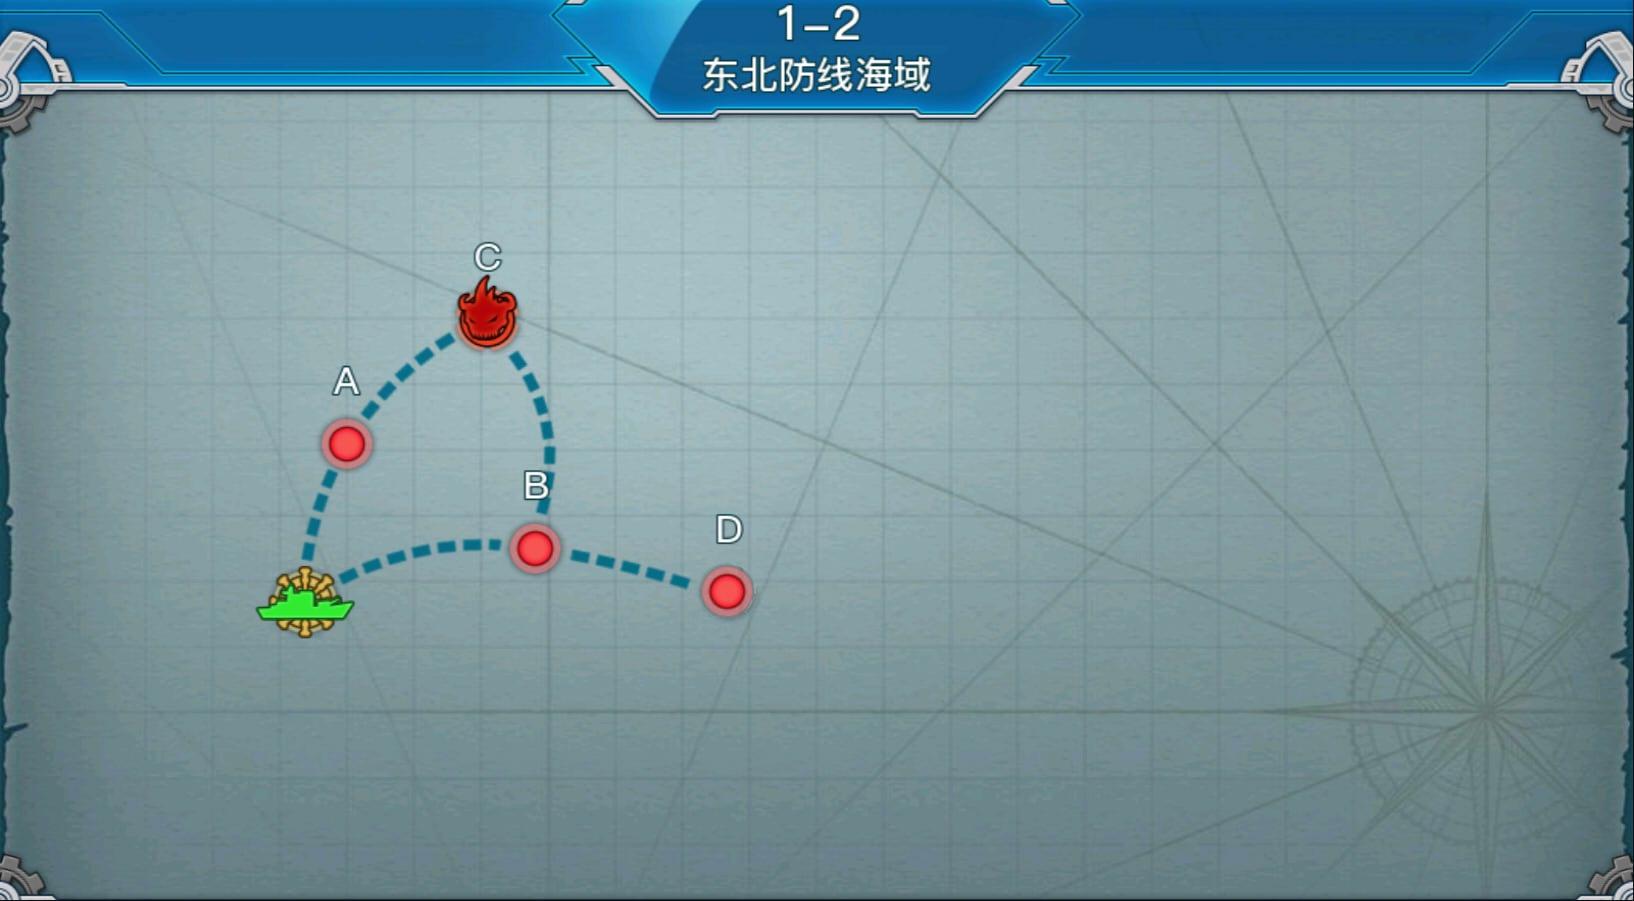 1-2 MAP2.jpg